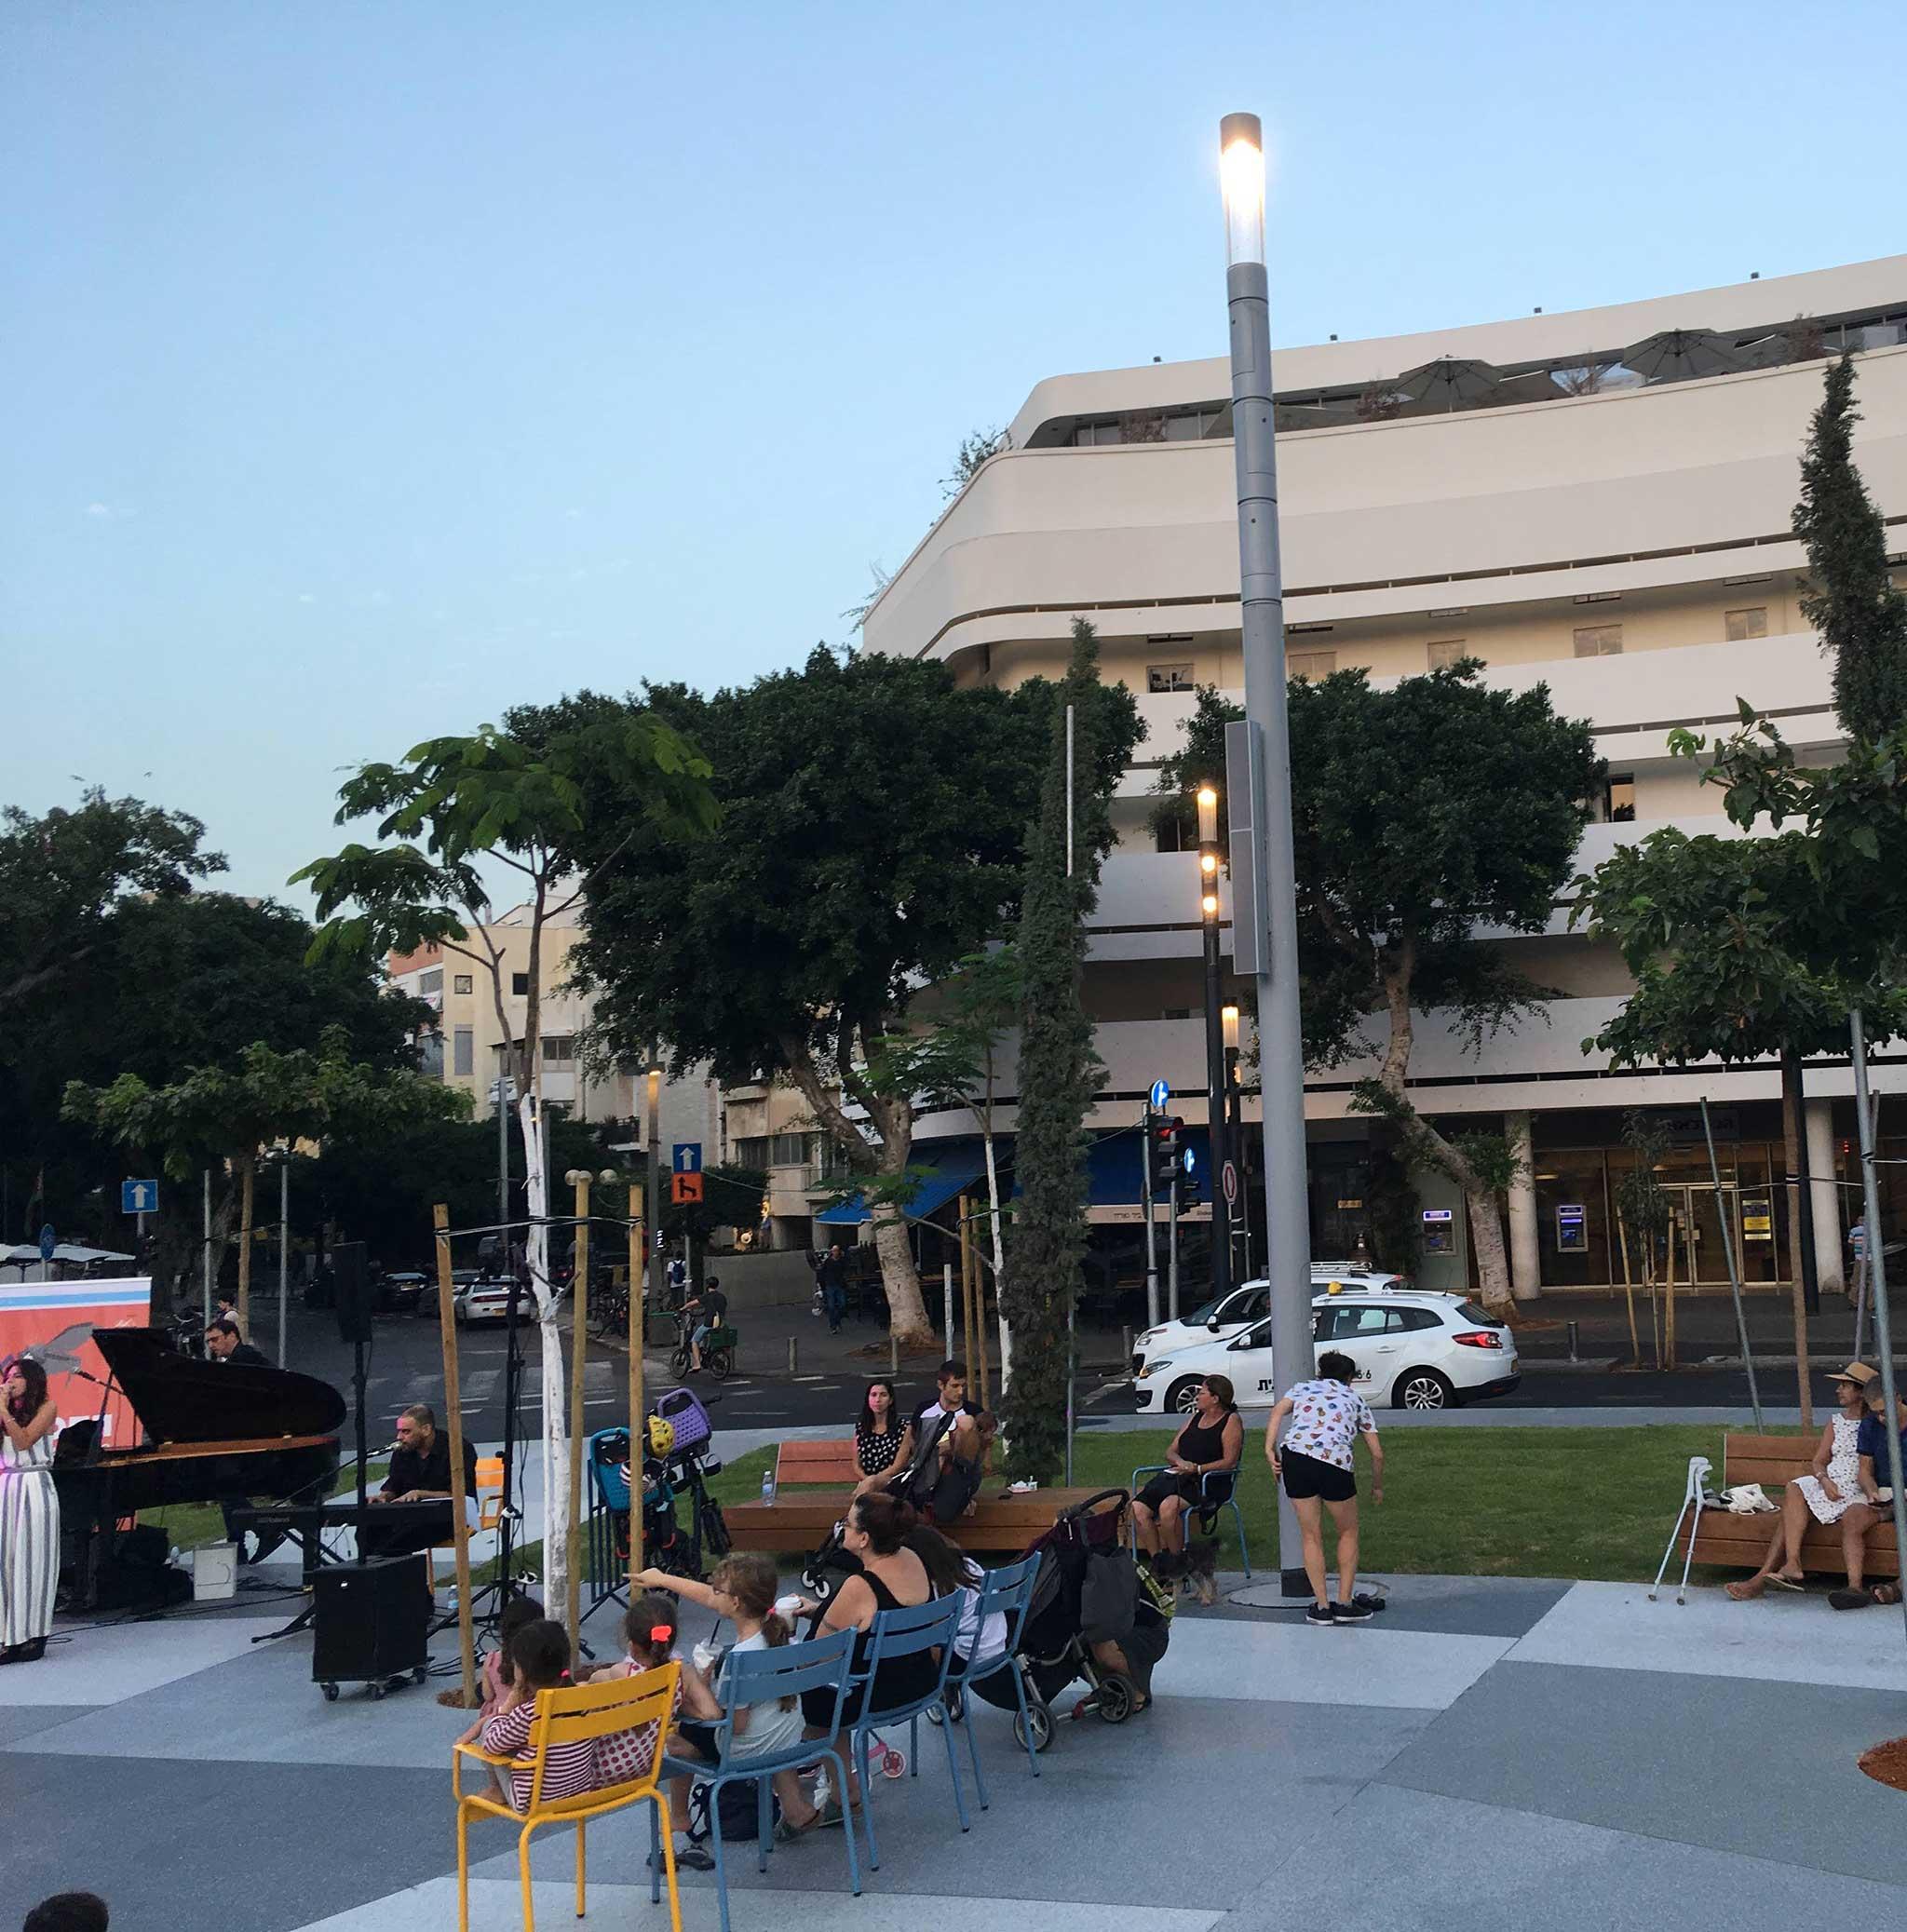 To Hotel Cinema on Tel Aviv audio tour The White City